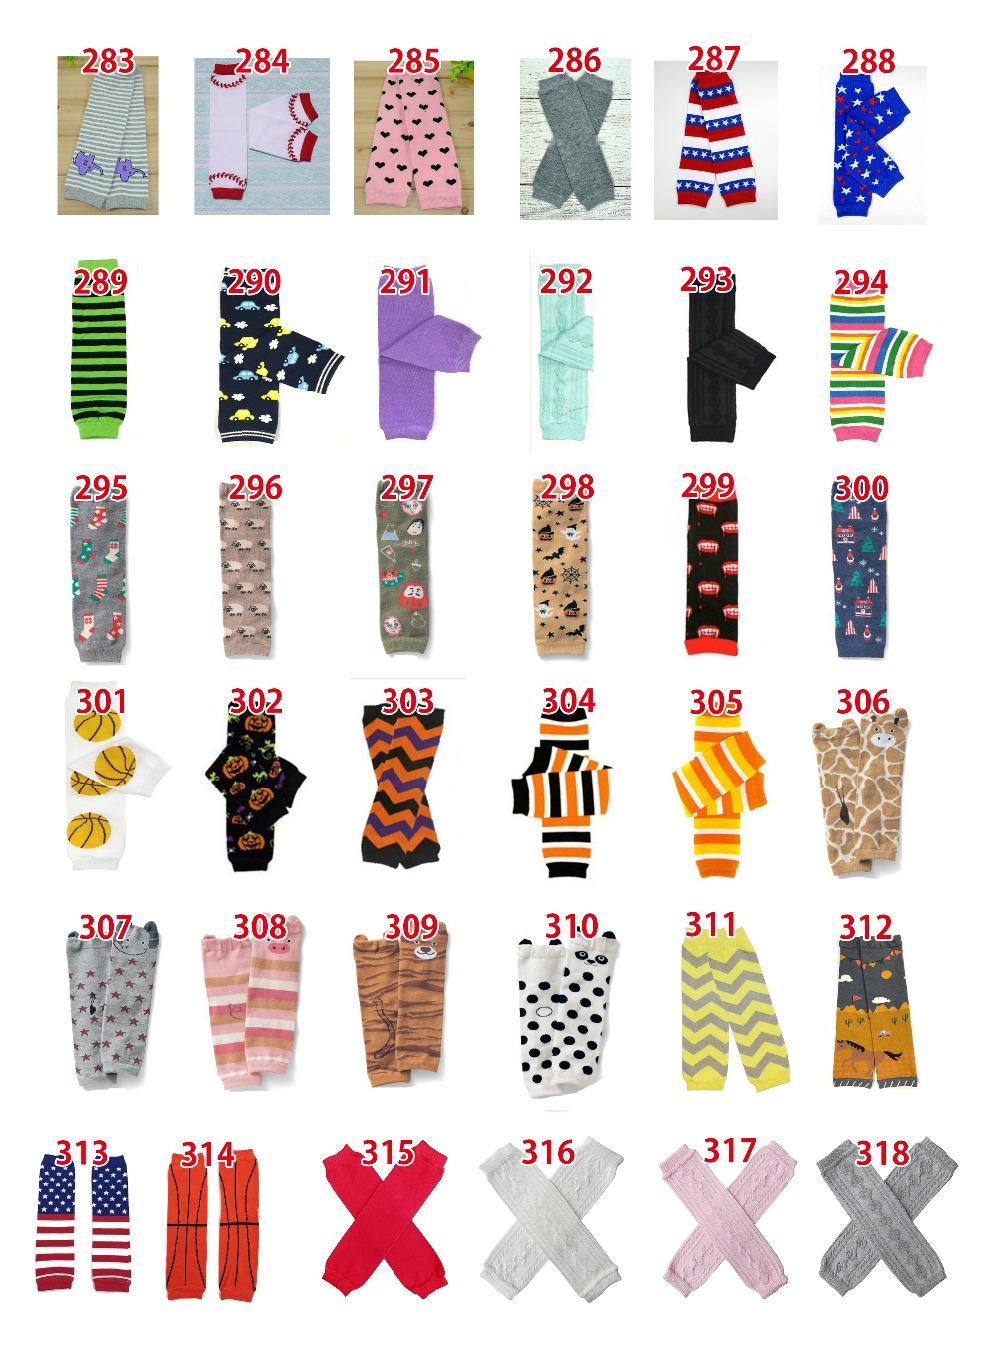 infant girls leopard zebra owl leg warmers 318 styles for choose baby boy chevron football leggings infant socks 24pairs(China (Mainland))